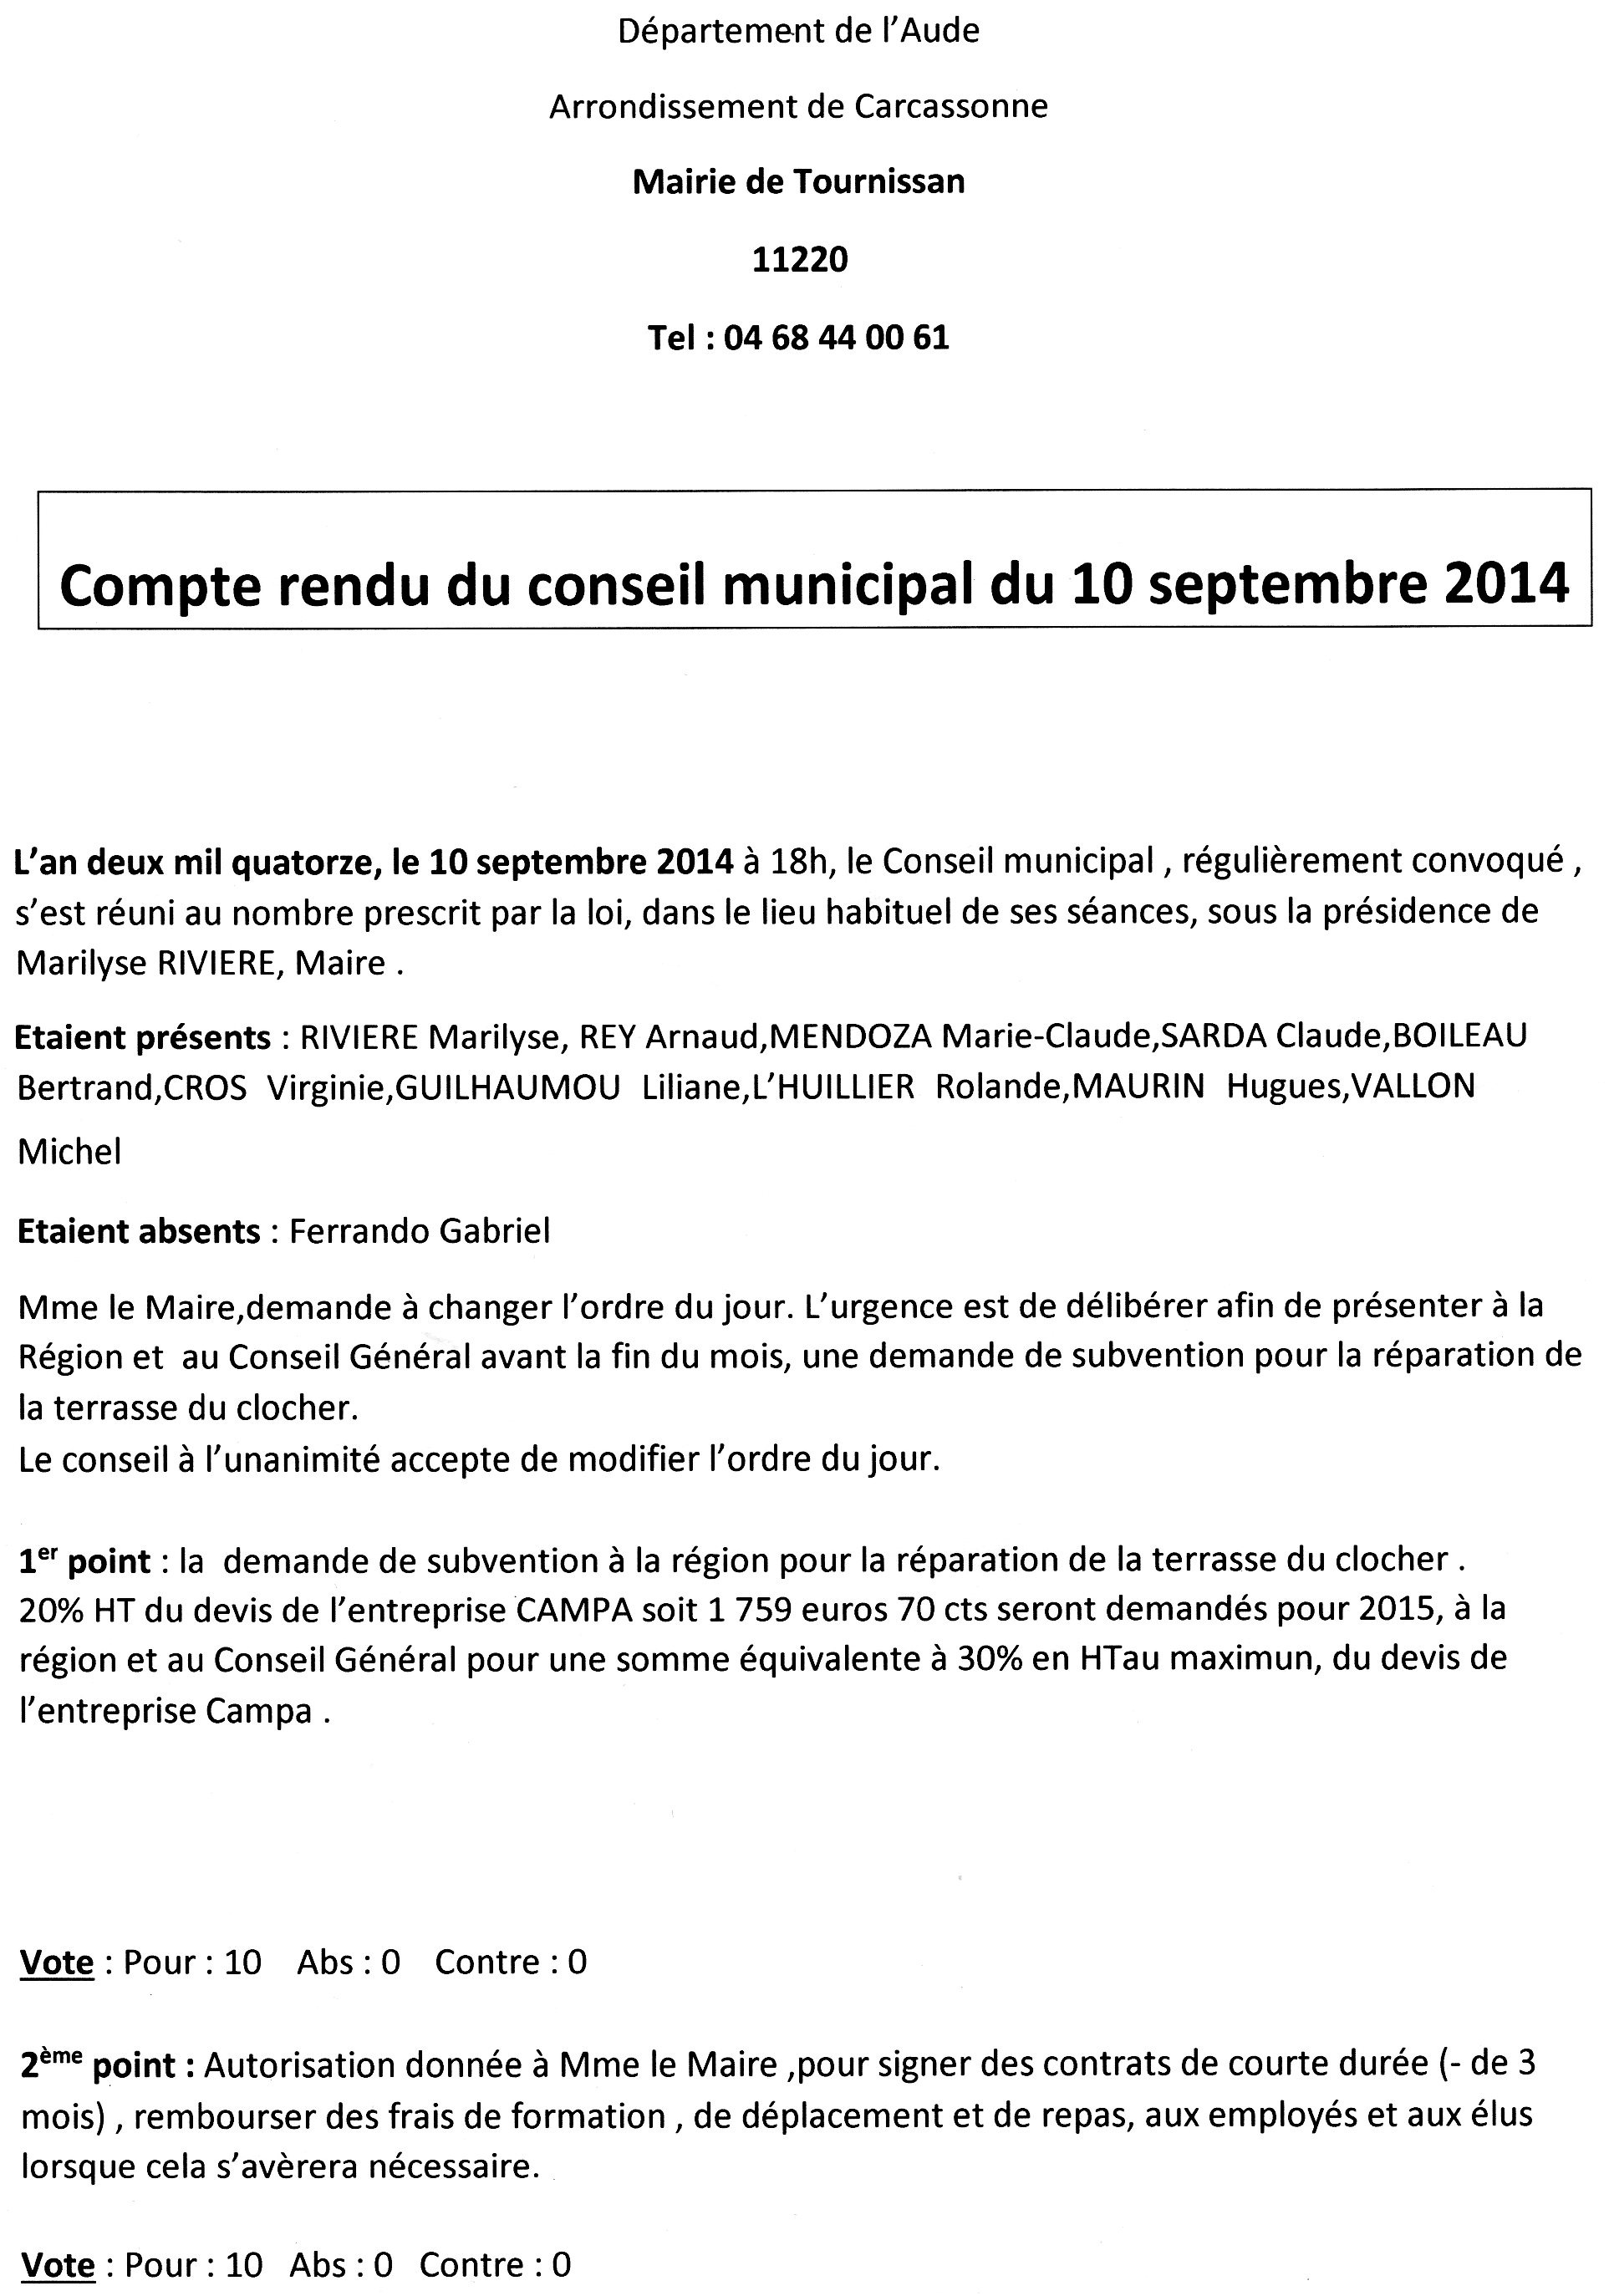 cpte rendu CM du 10 sept 2014 p1